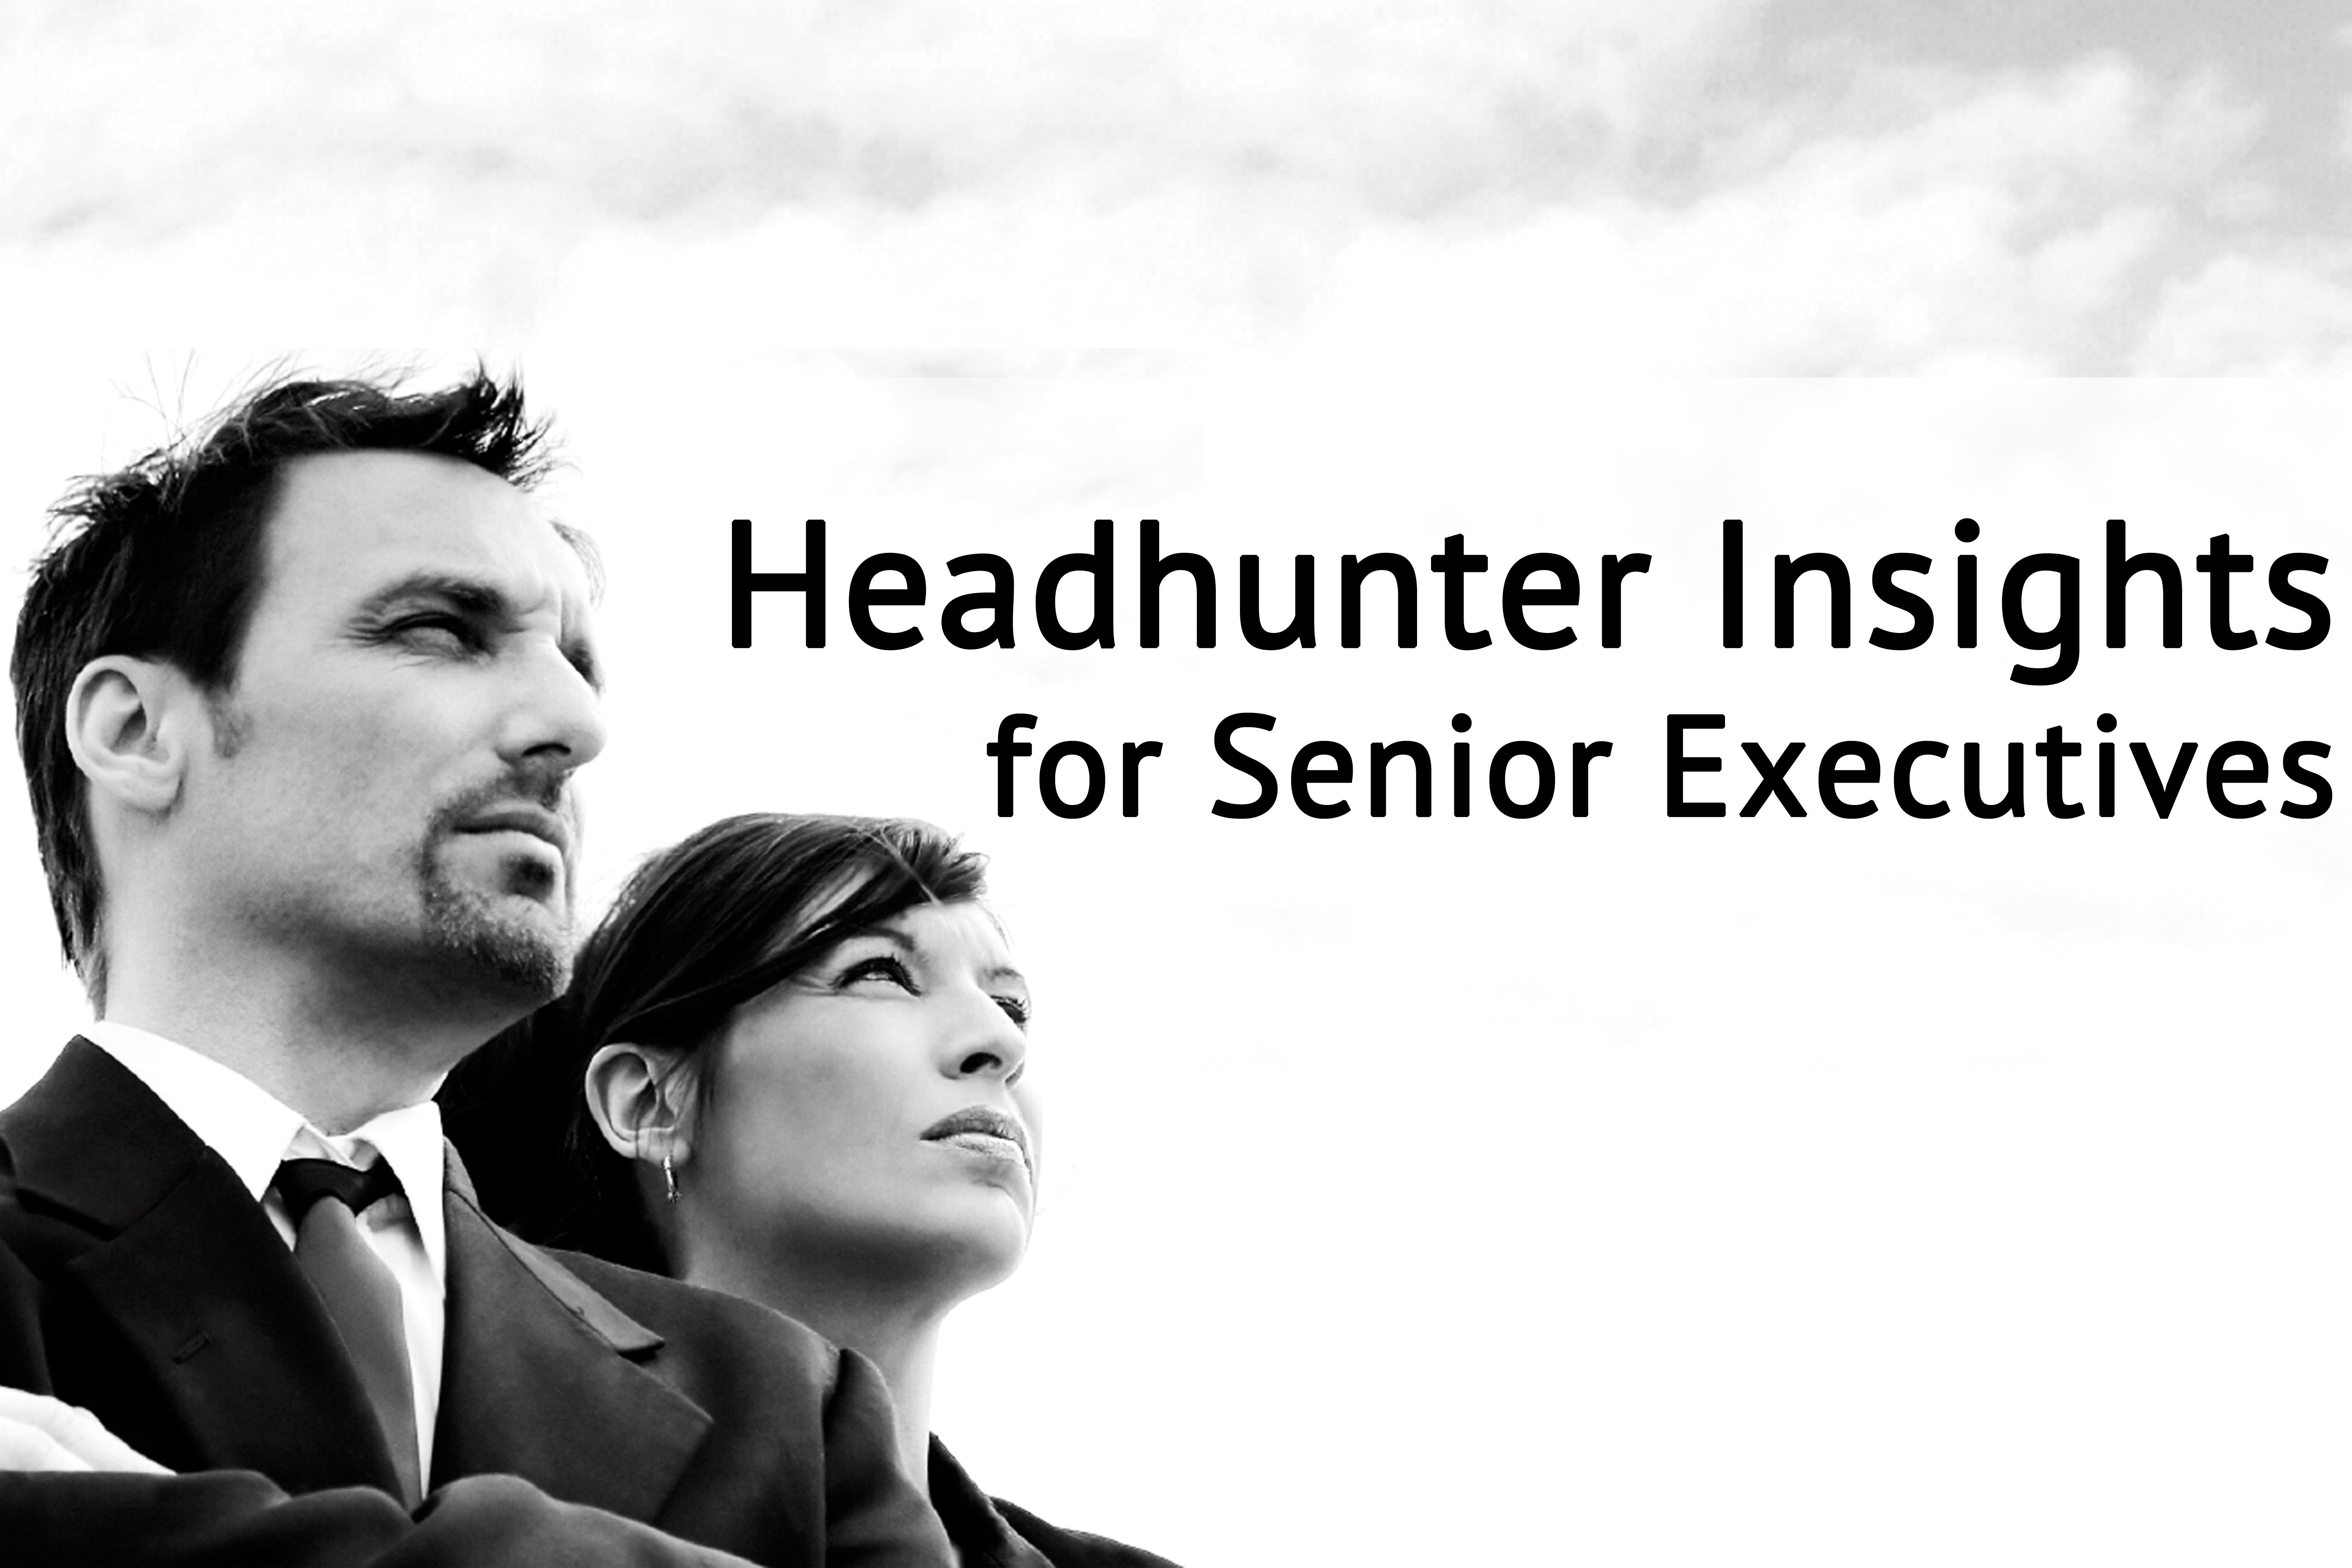 Headhunter Insights for Senior Executives